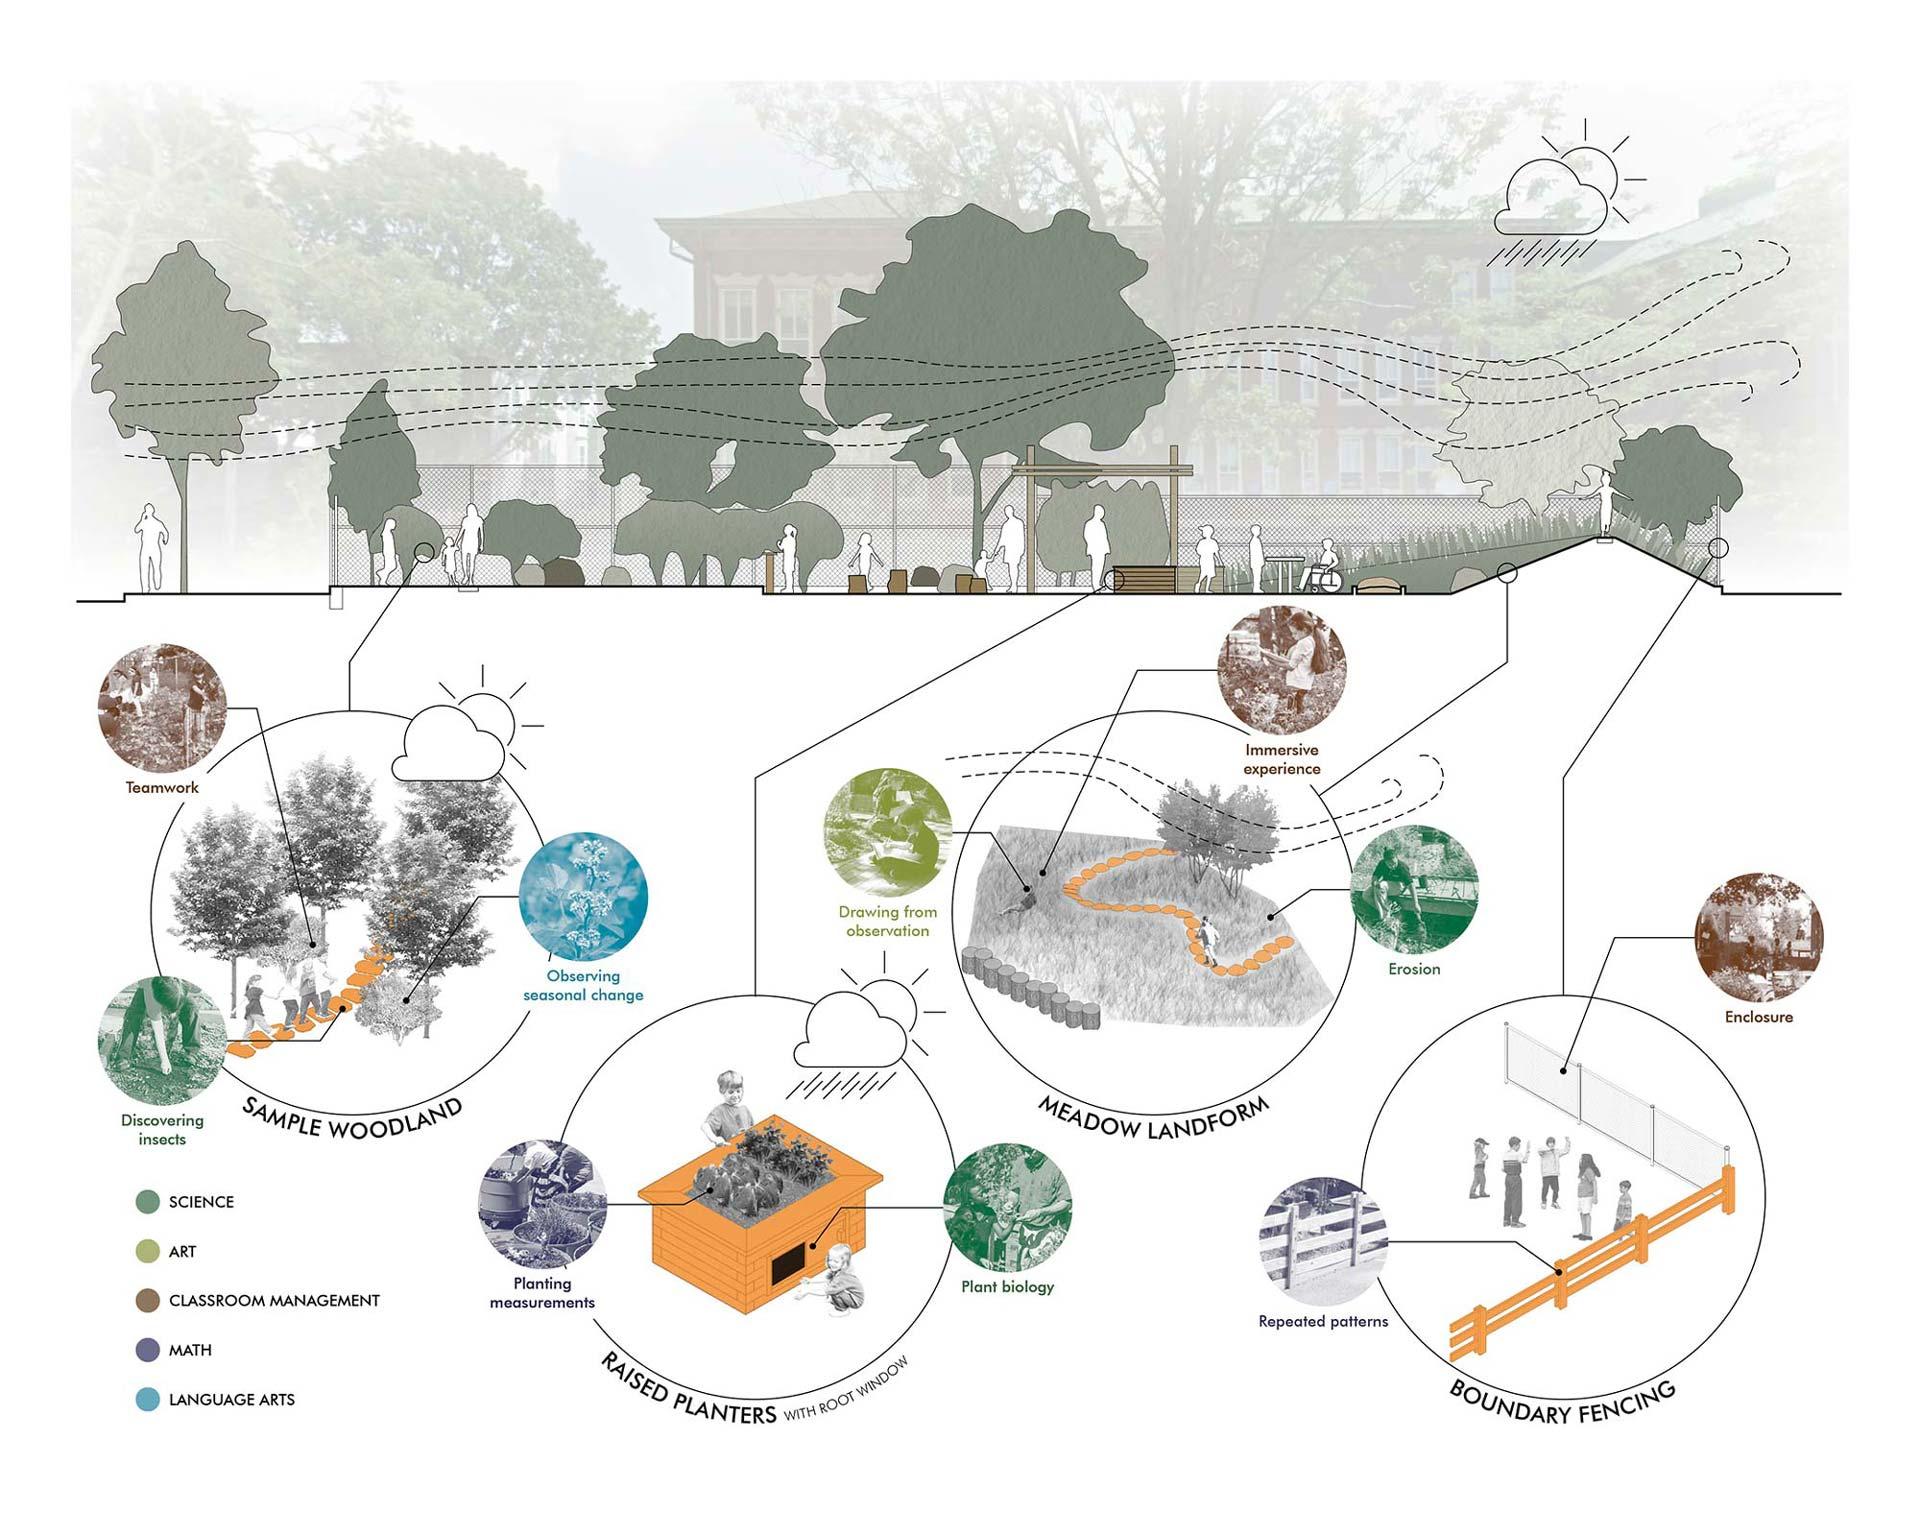 9_Schoolyard-Initiative_Klopfer-Martin-Design-Group_diagram_outdoor-classroom.jpg